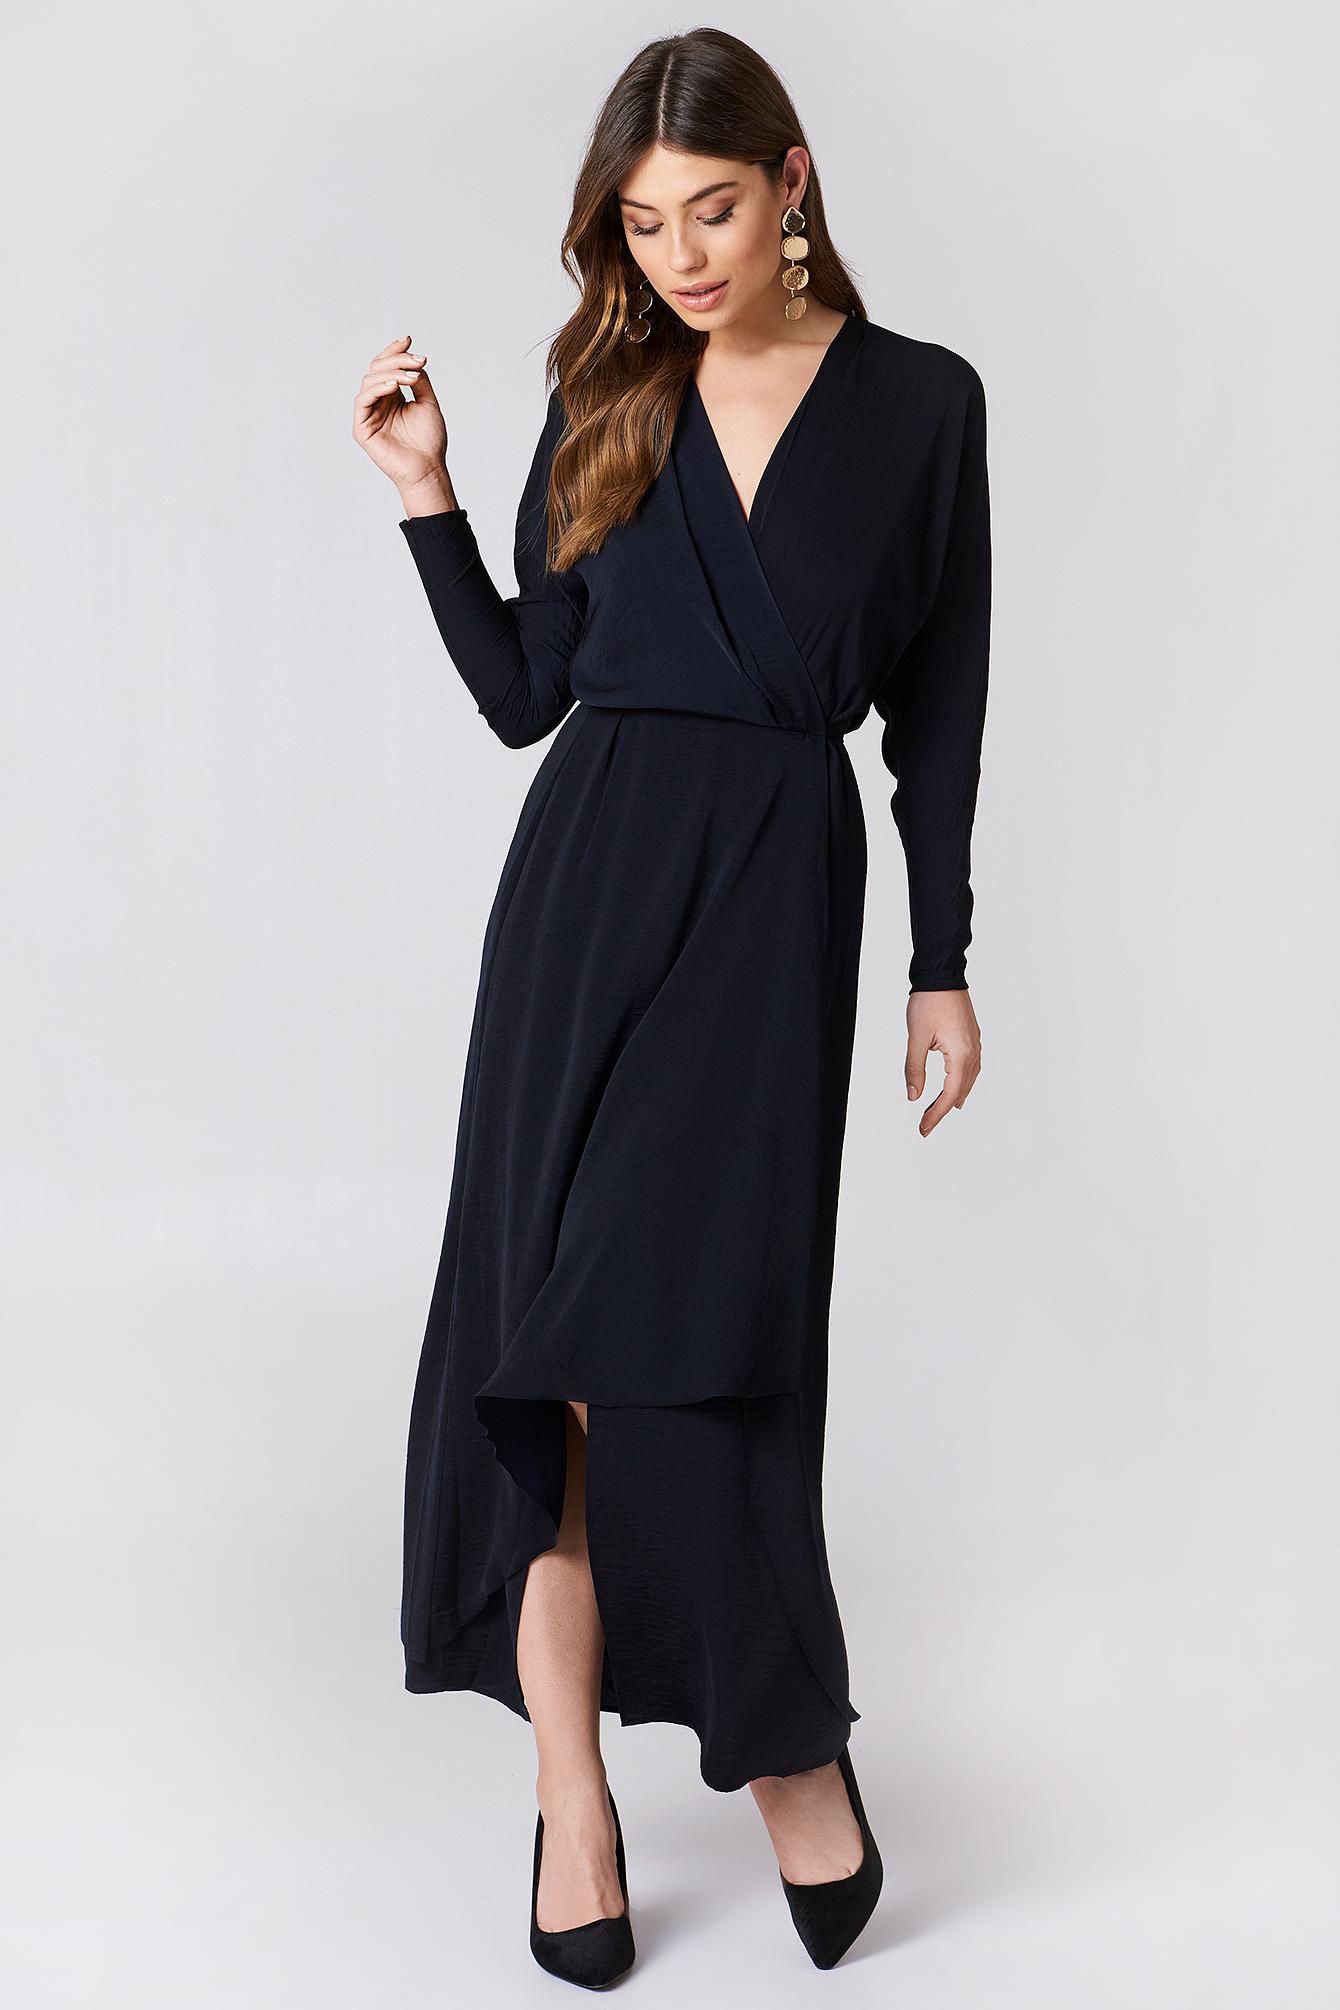 Filippa K Drapey Wrap Dress Navy Fashion Style Fan